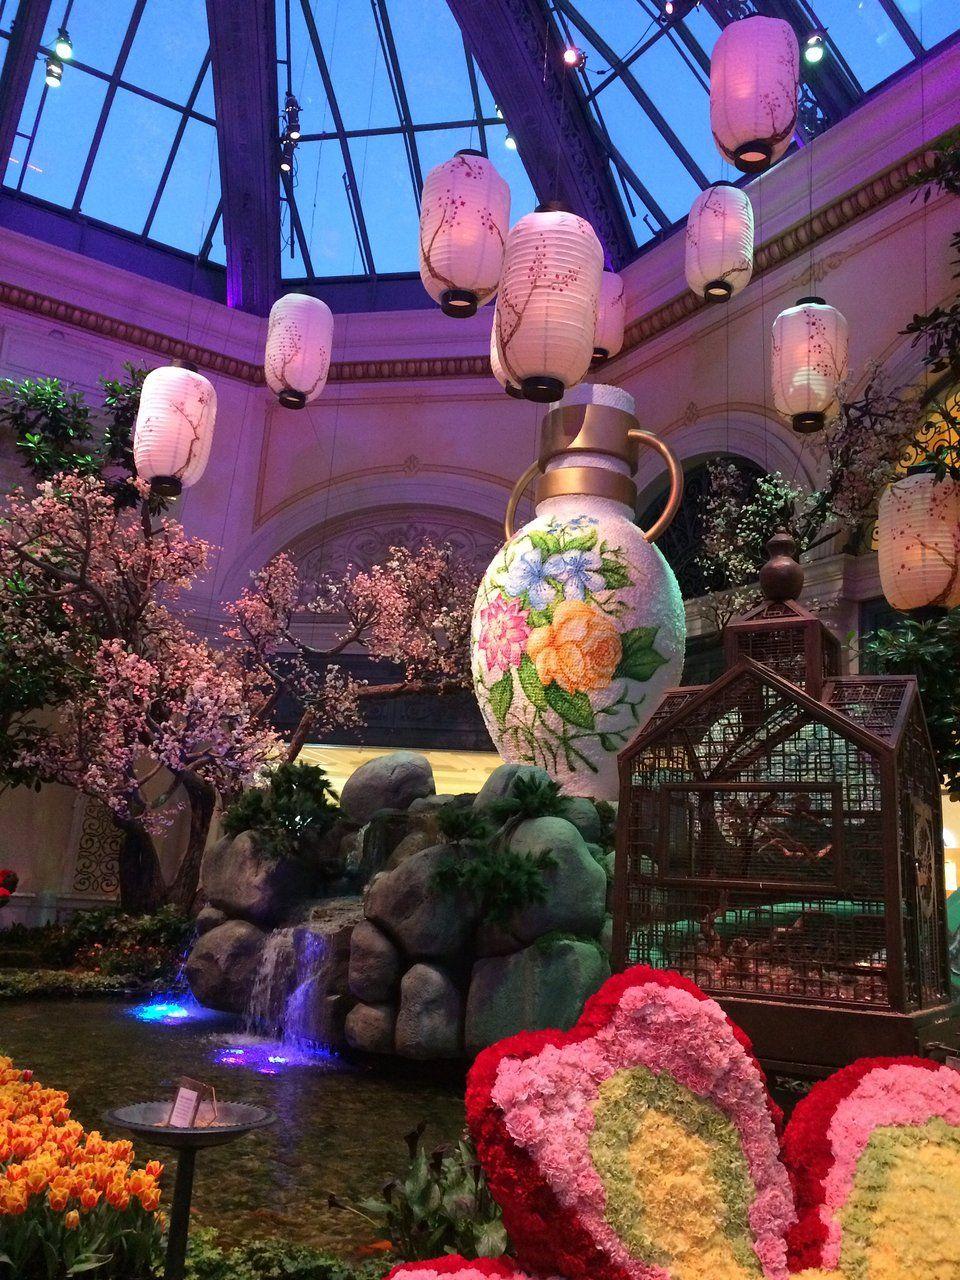 63aec65481c456b1cf56bd5ee02cf55c - Bellagio Conservatory & Botanical Gardens Las Vegas